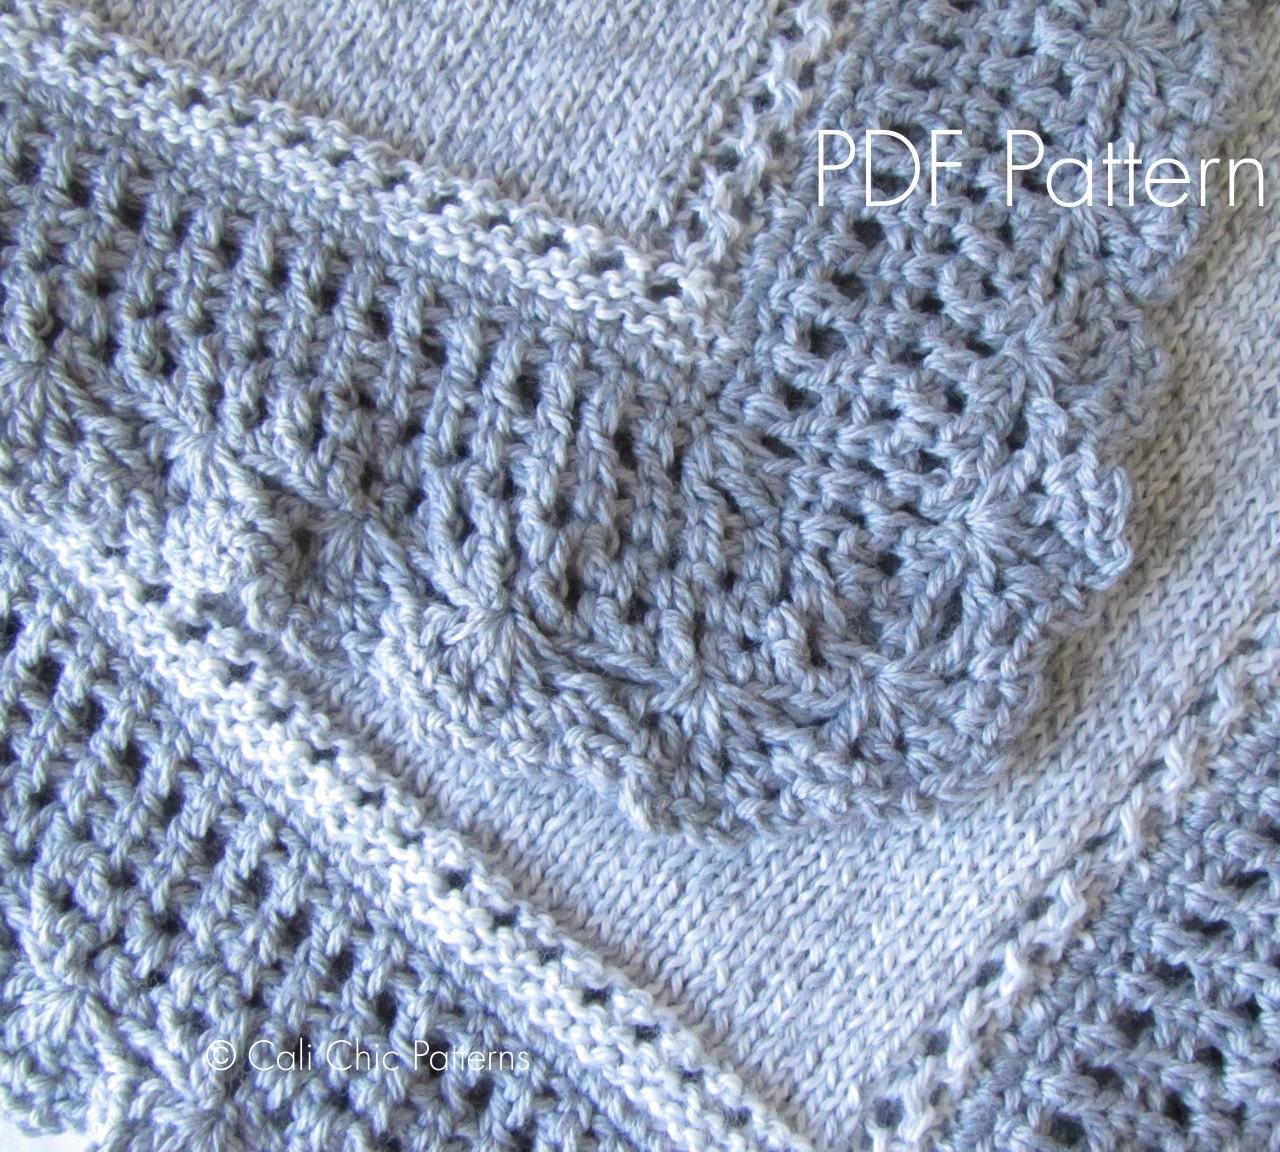 Knit Baby Blanket PATTERN 71 Royal Knitting By